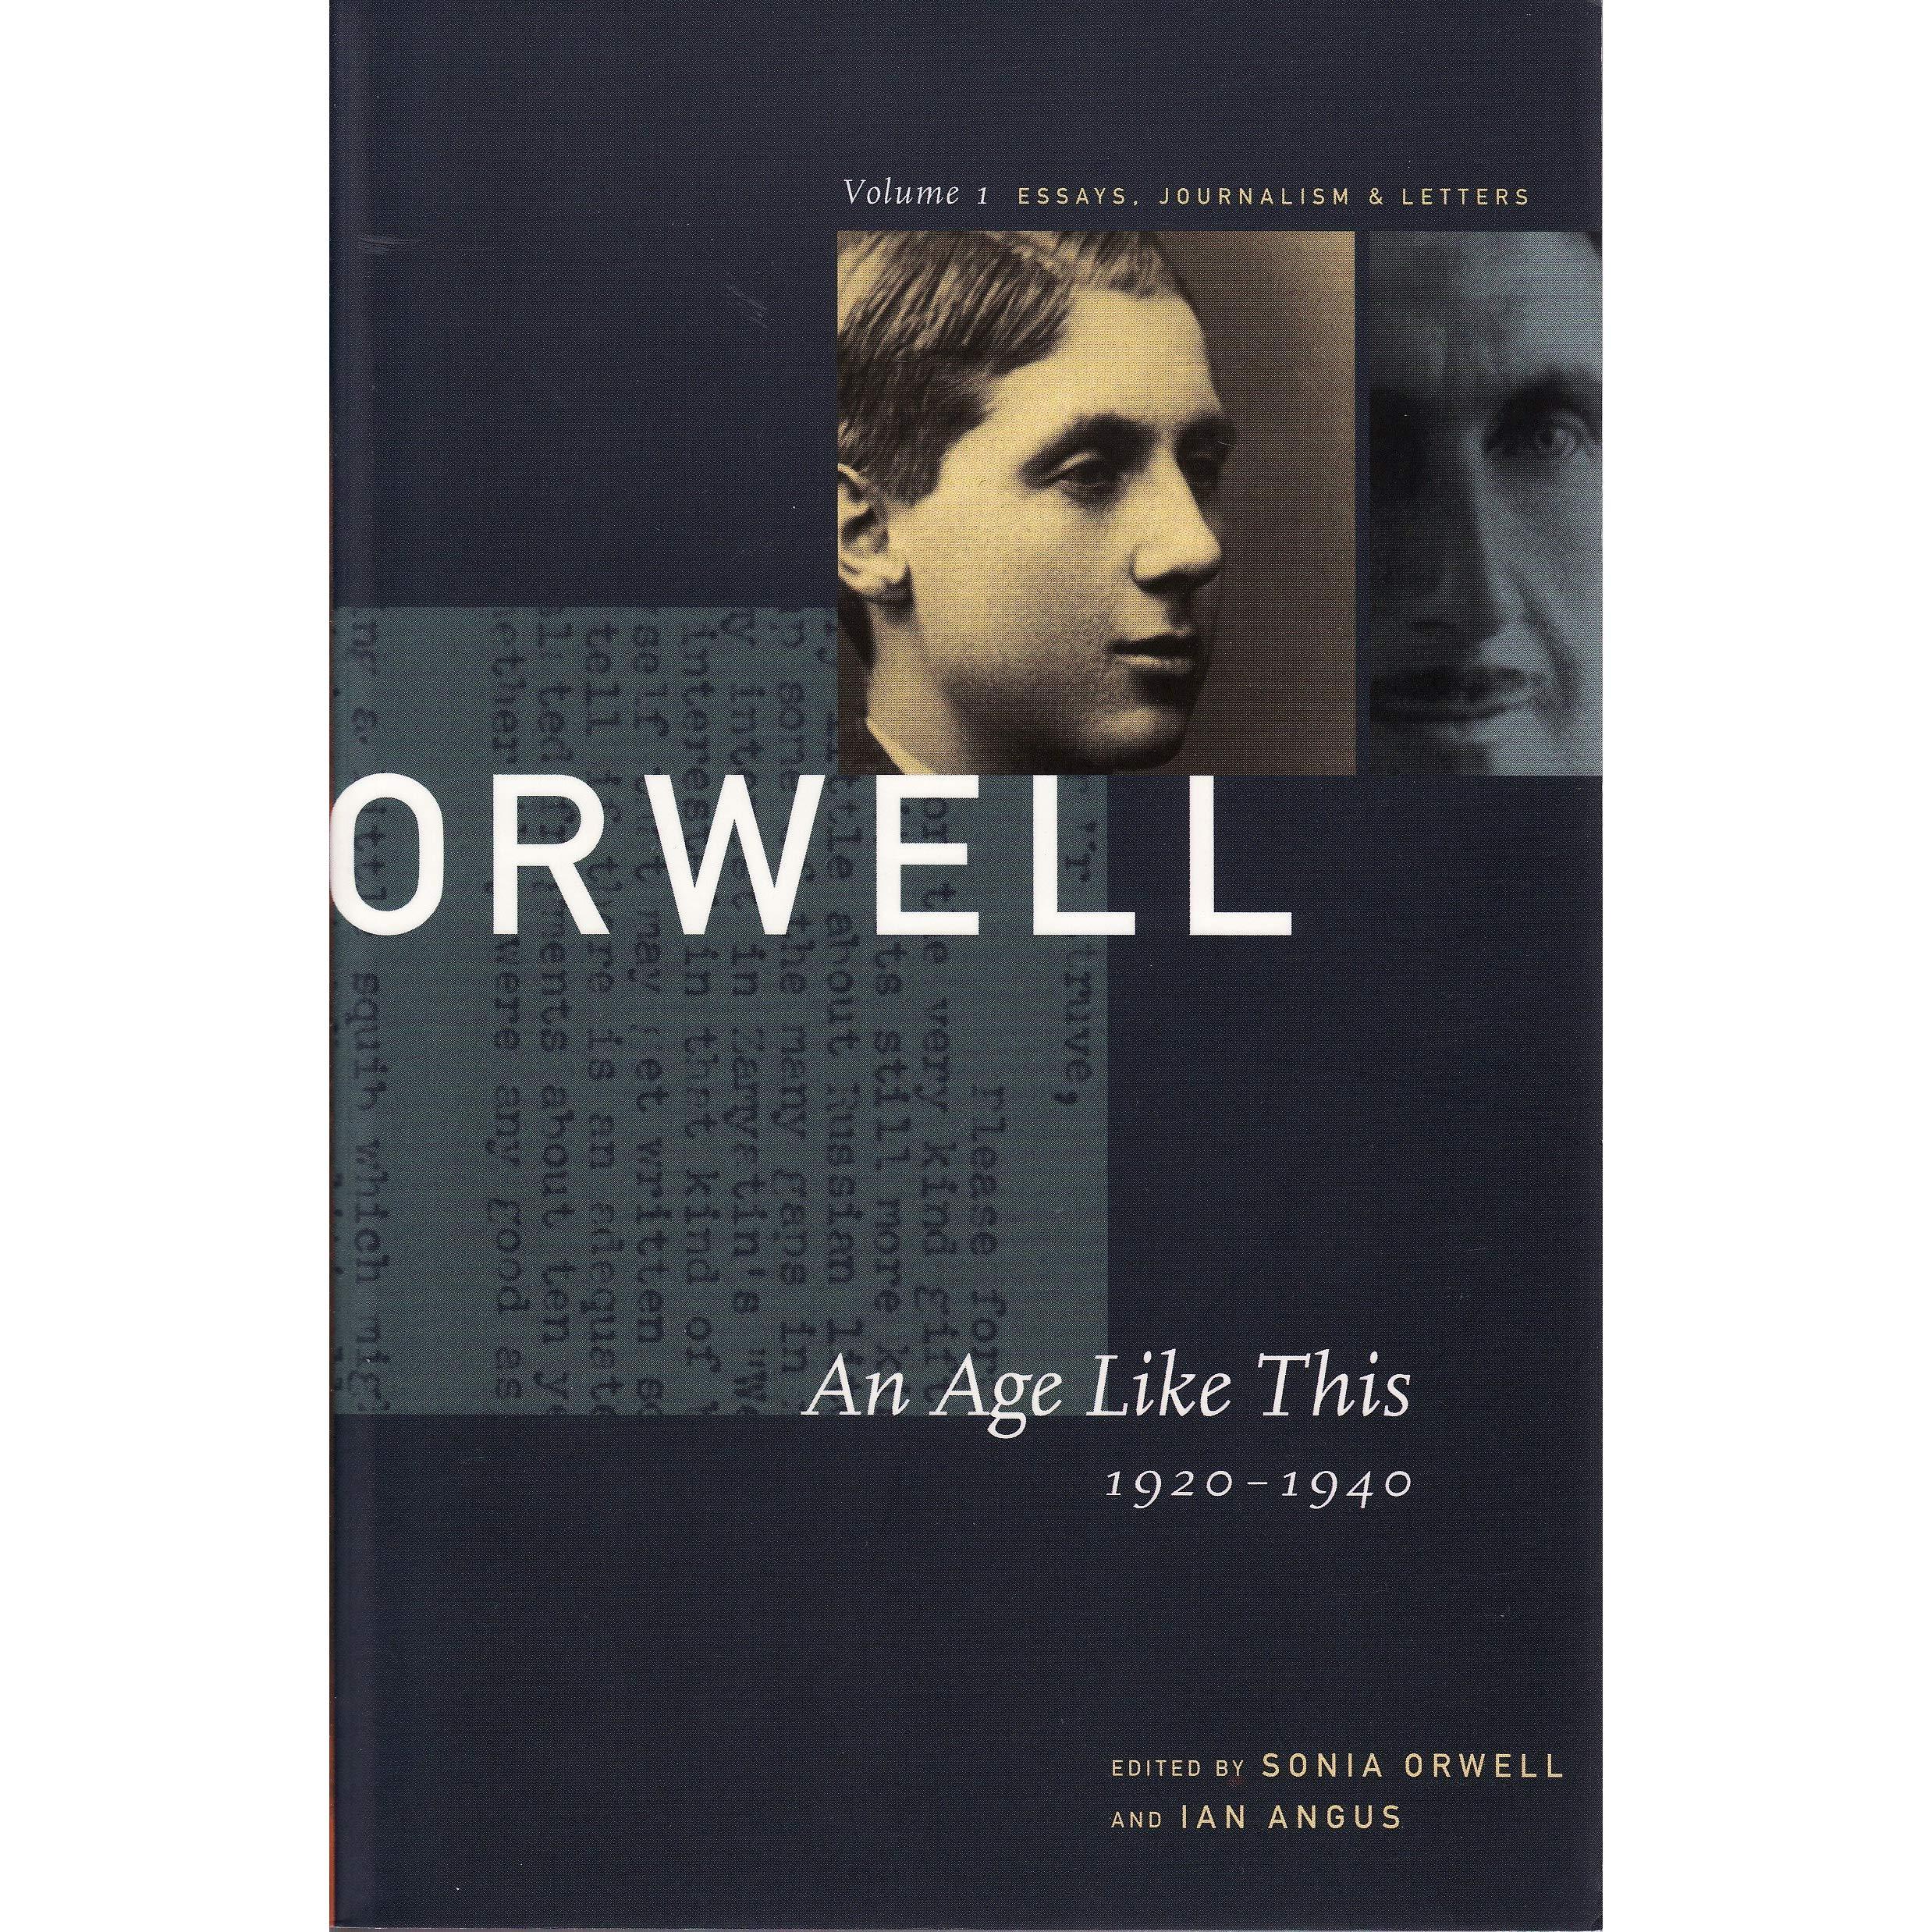 020 Orwell Essays Essay Example  Uy2476 Ss2476 Singular Themes Epub George Pdf DownloadFull